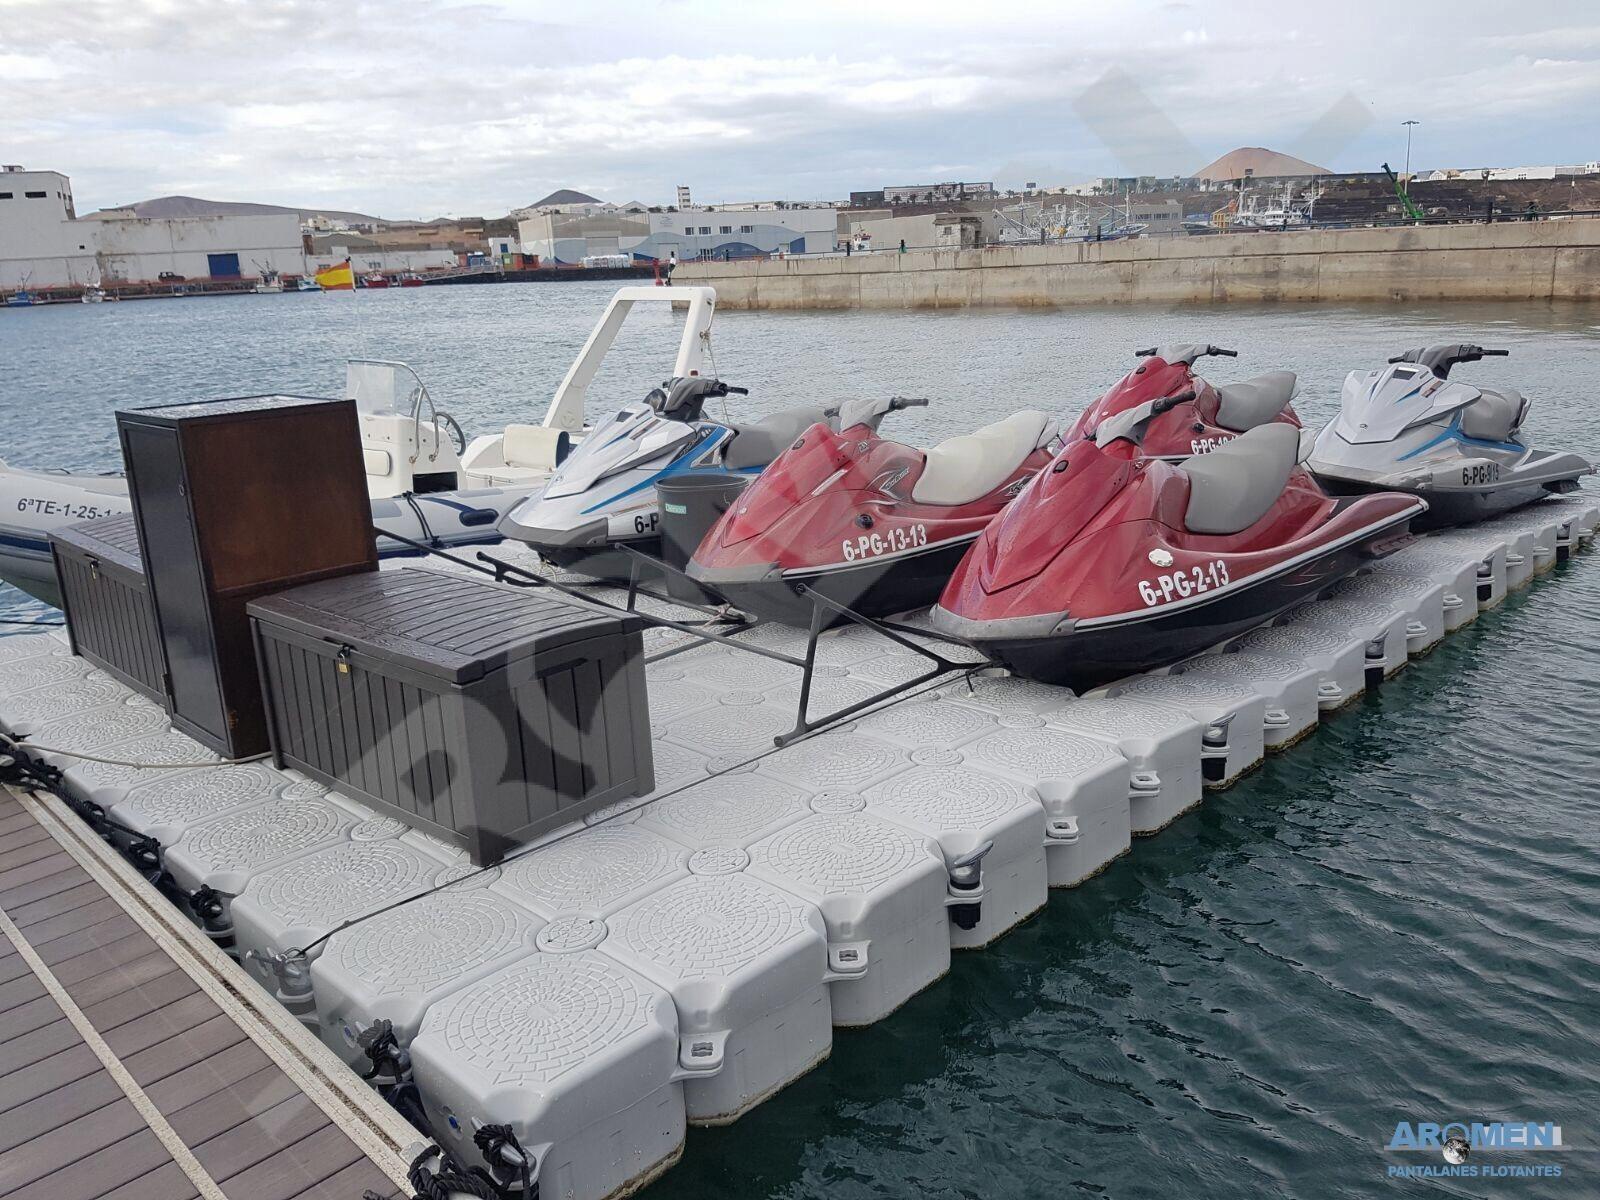 puerto-jet-ski-marina-de-lanzarote-2